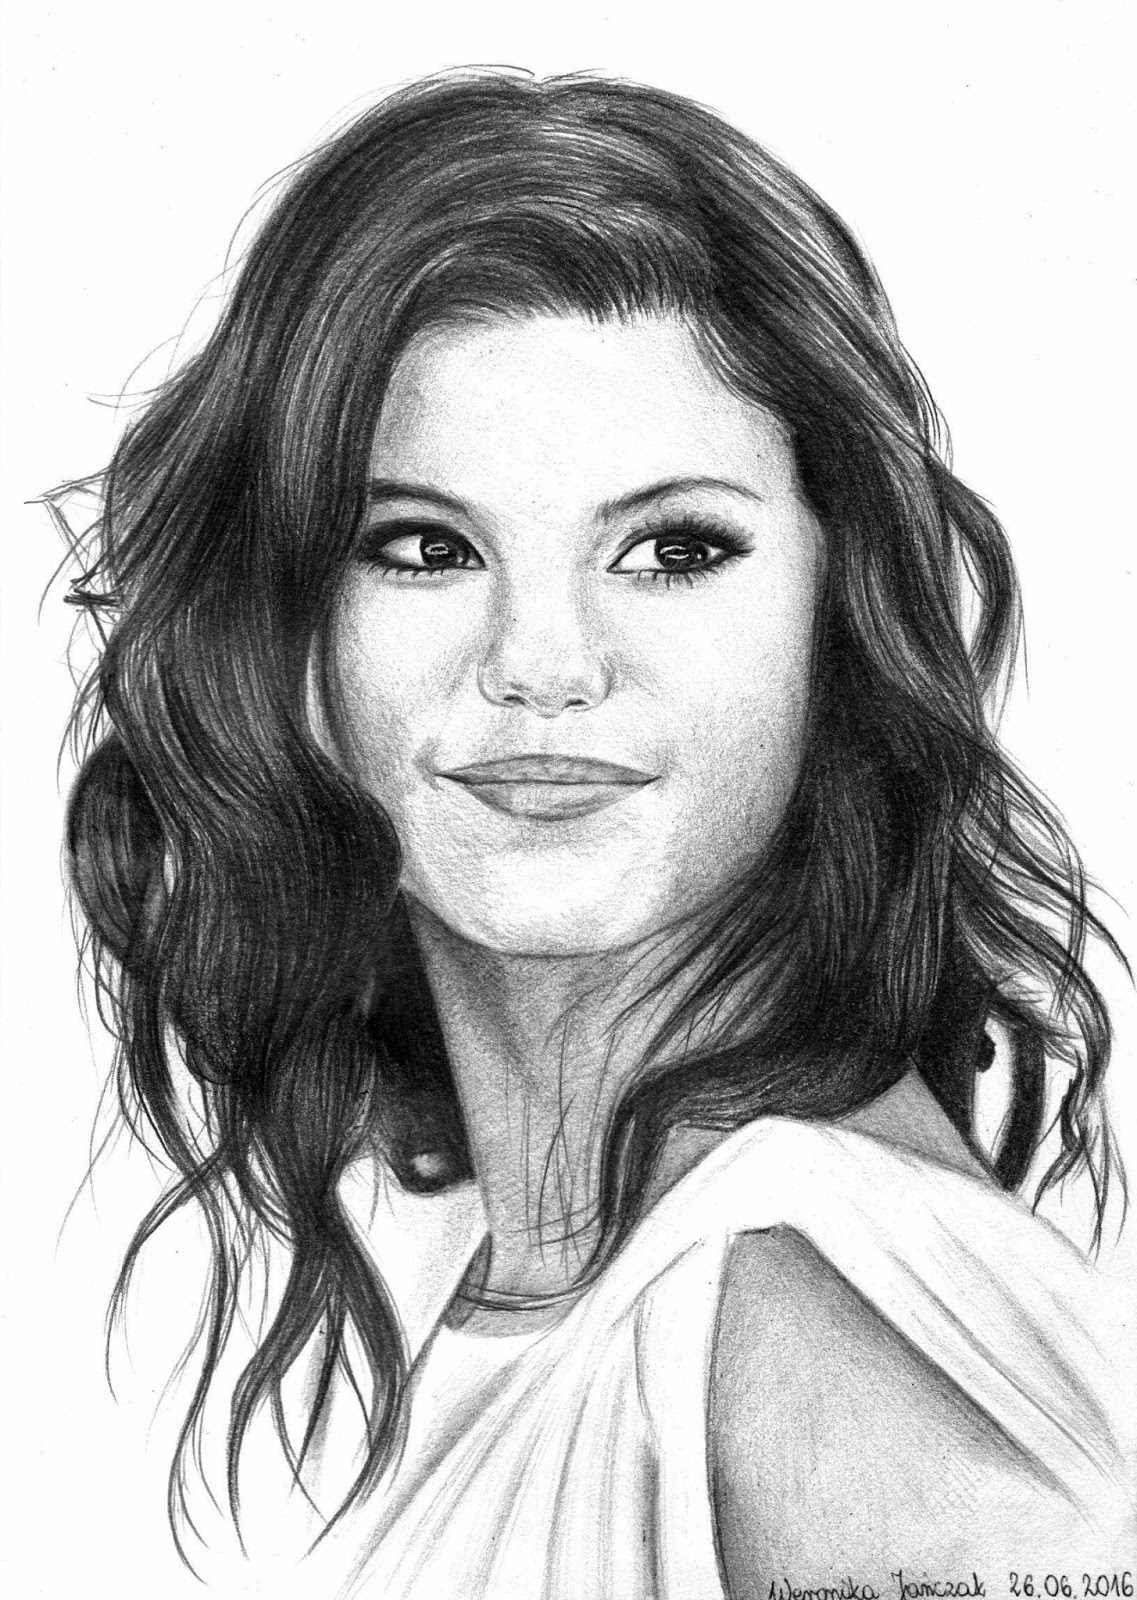 Amiluna art blog o rysowaniu portrety selena gomez - Selena gomez dessin ...